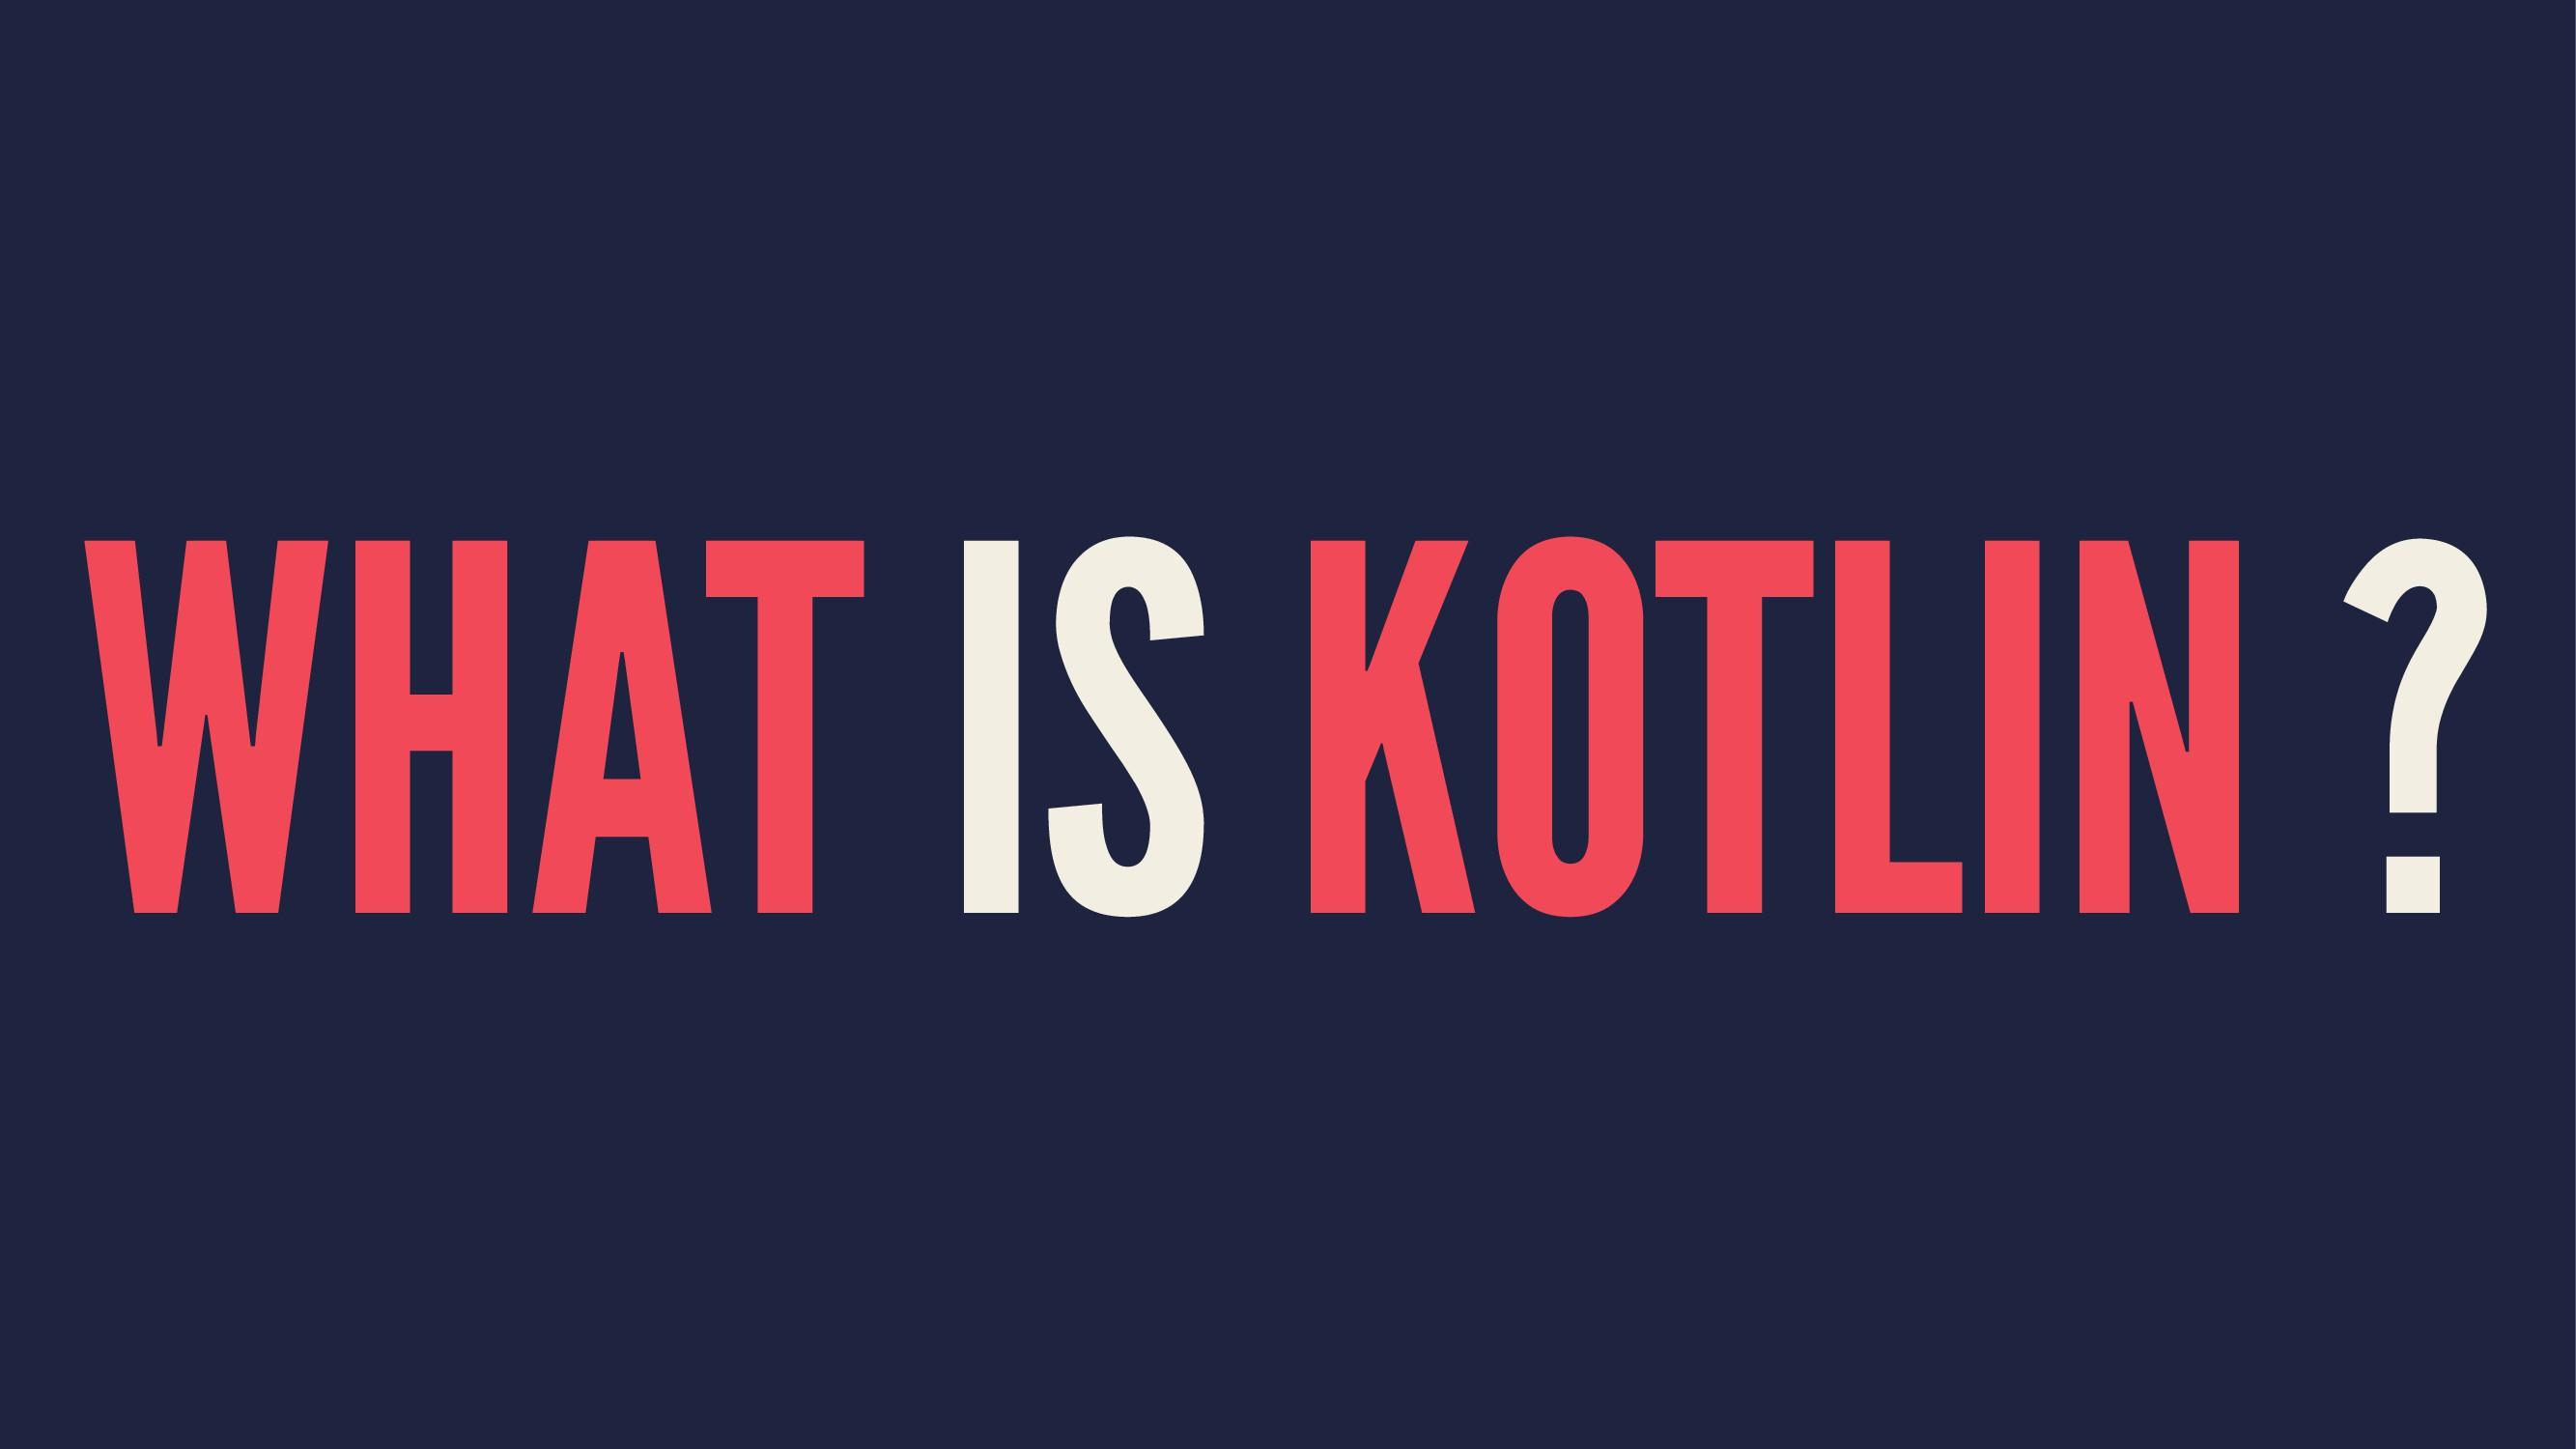 WHAT IS KOTLIN ?